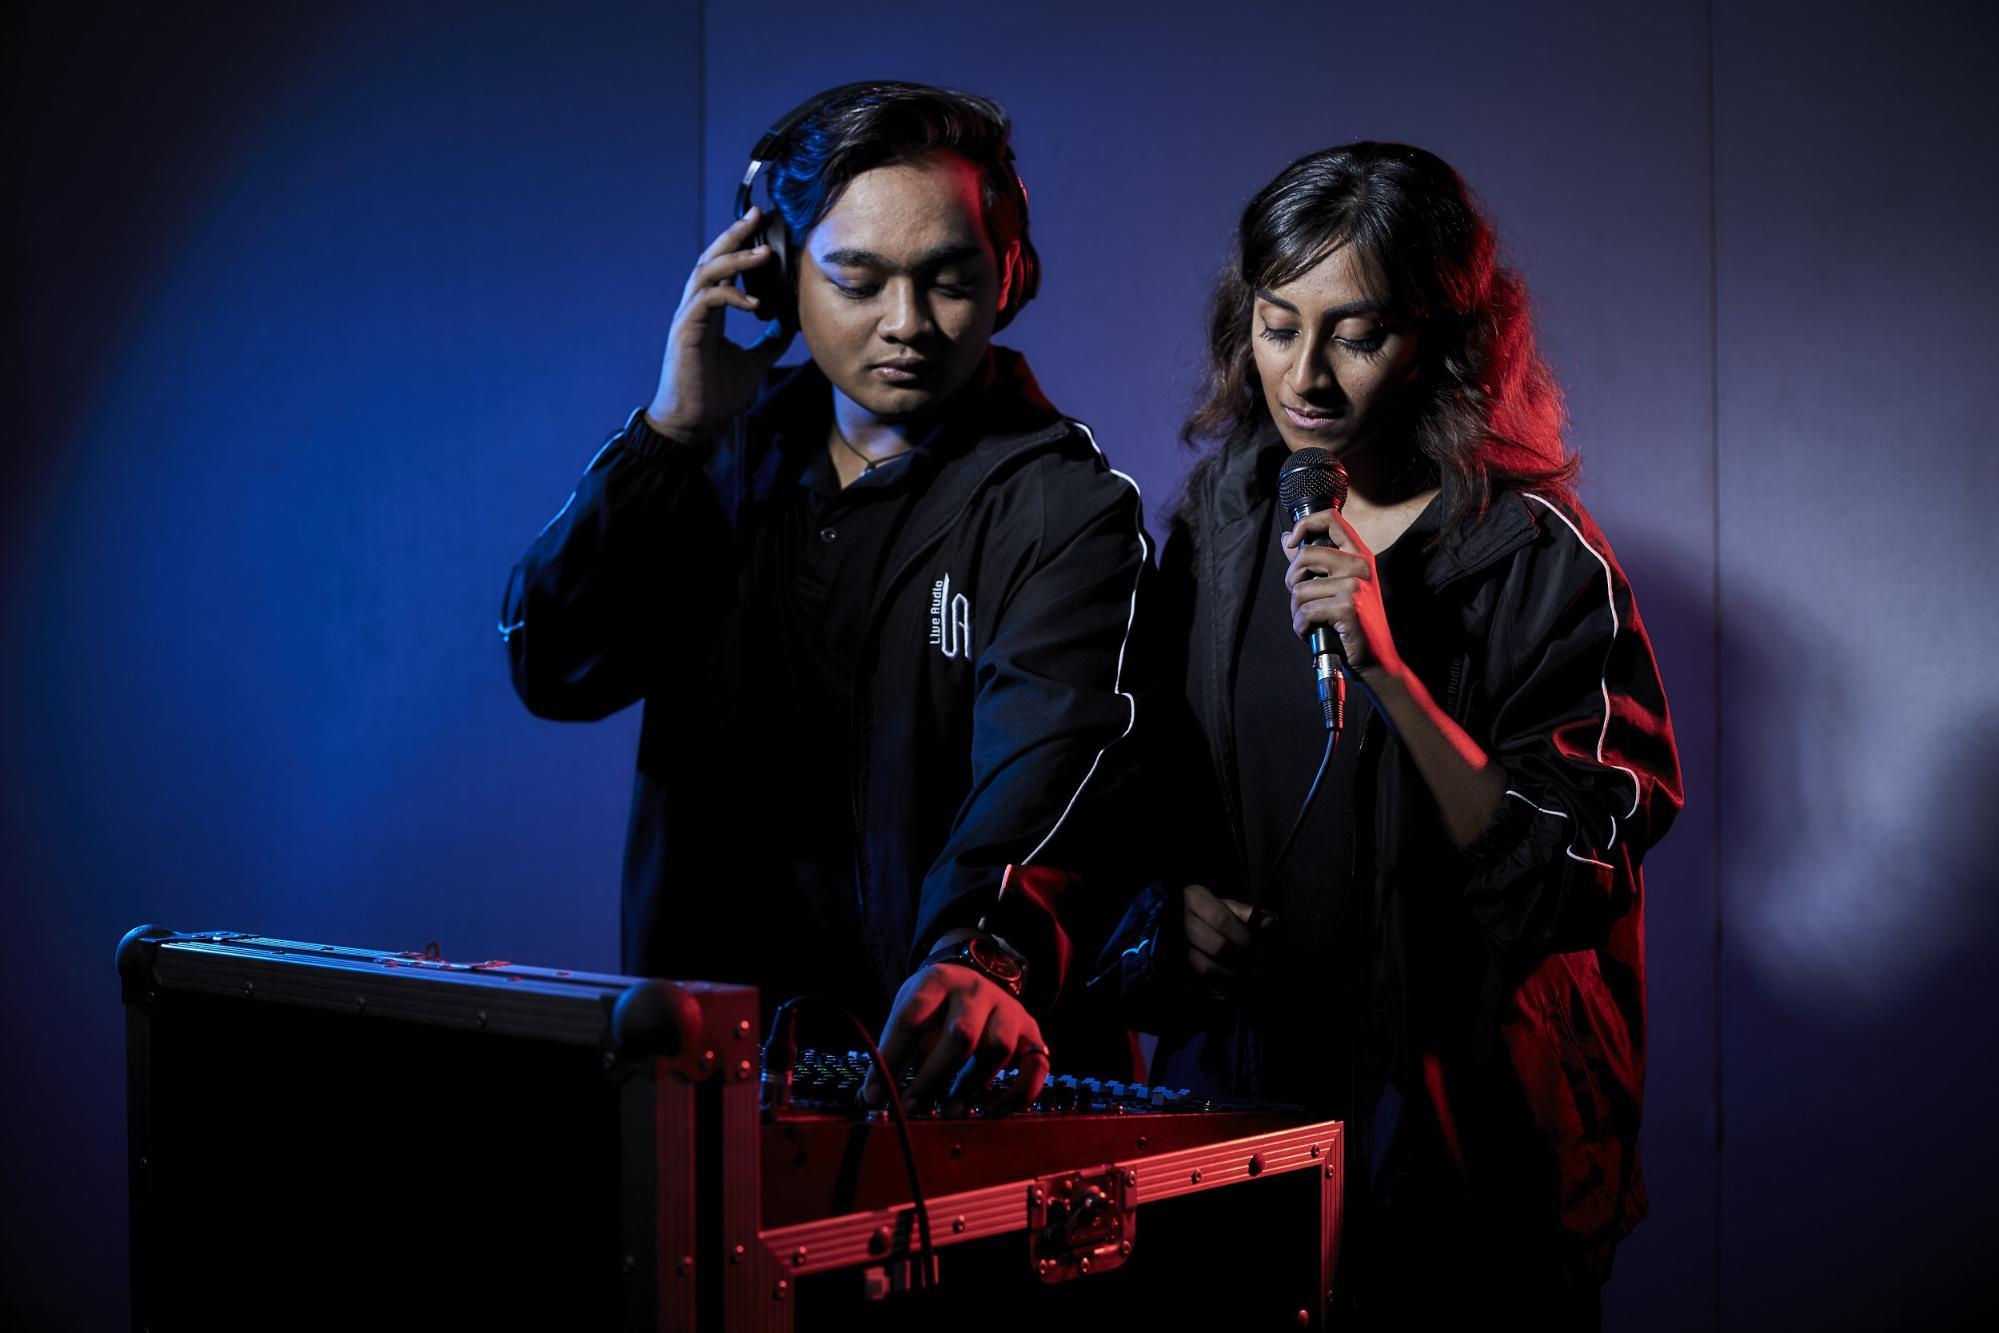 polytechnic to local university - live audio cca at nanyang polytechnic